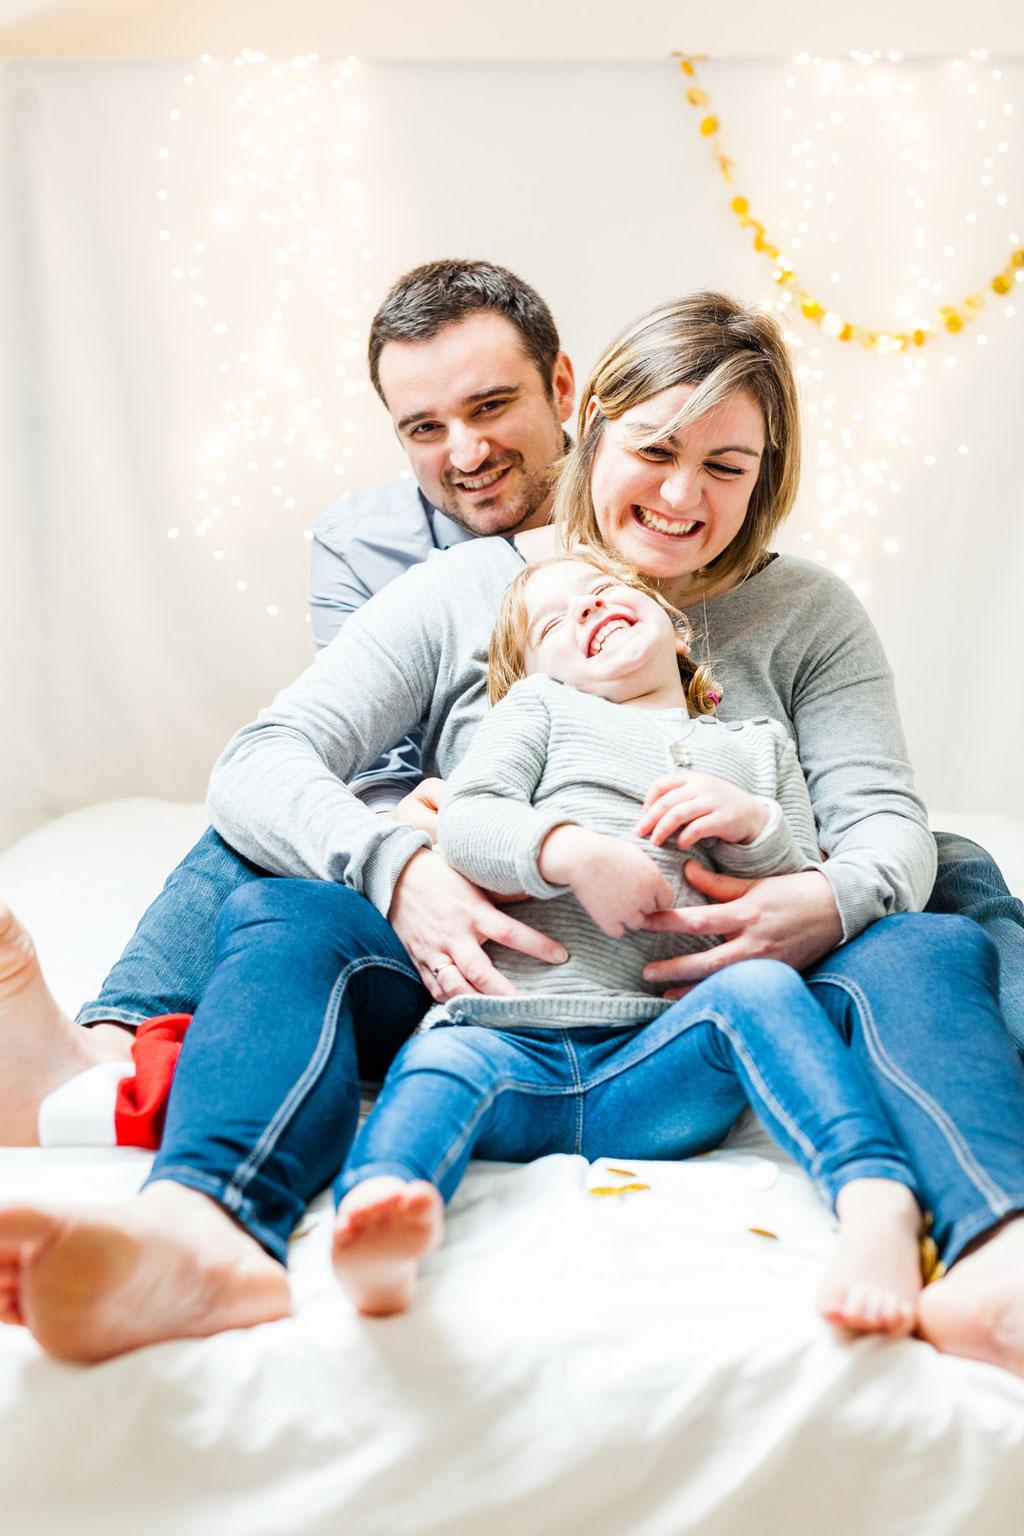 Photographe de famille à nantes home studio Orlane Boisard